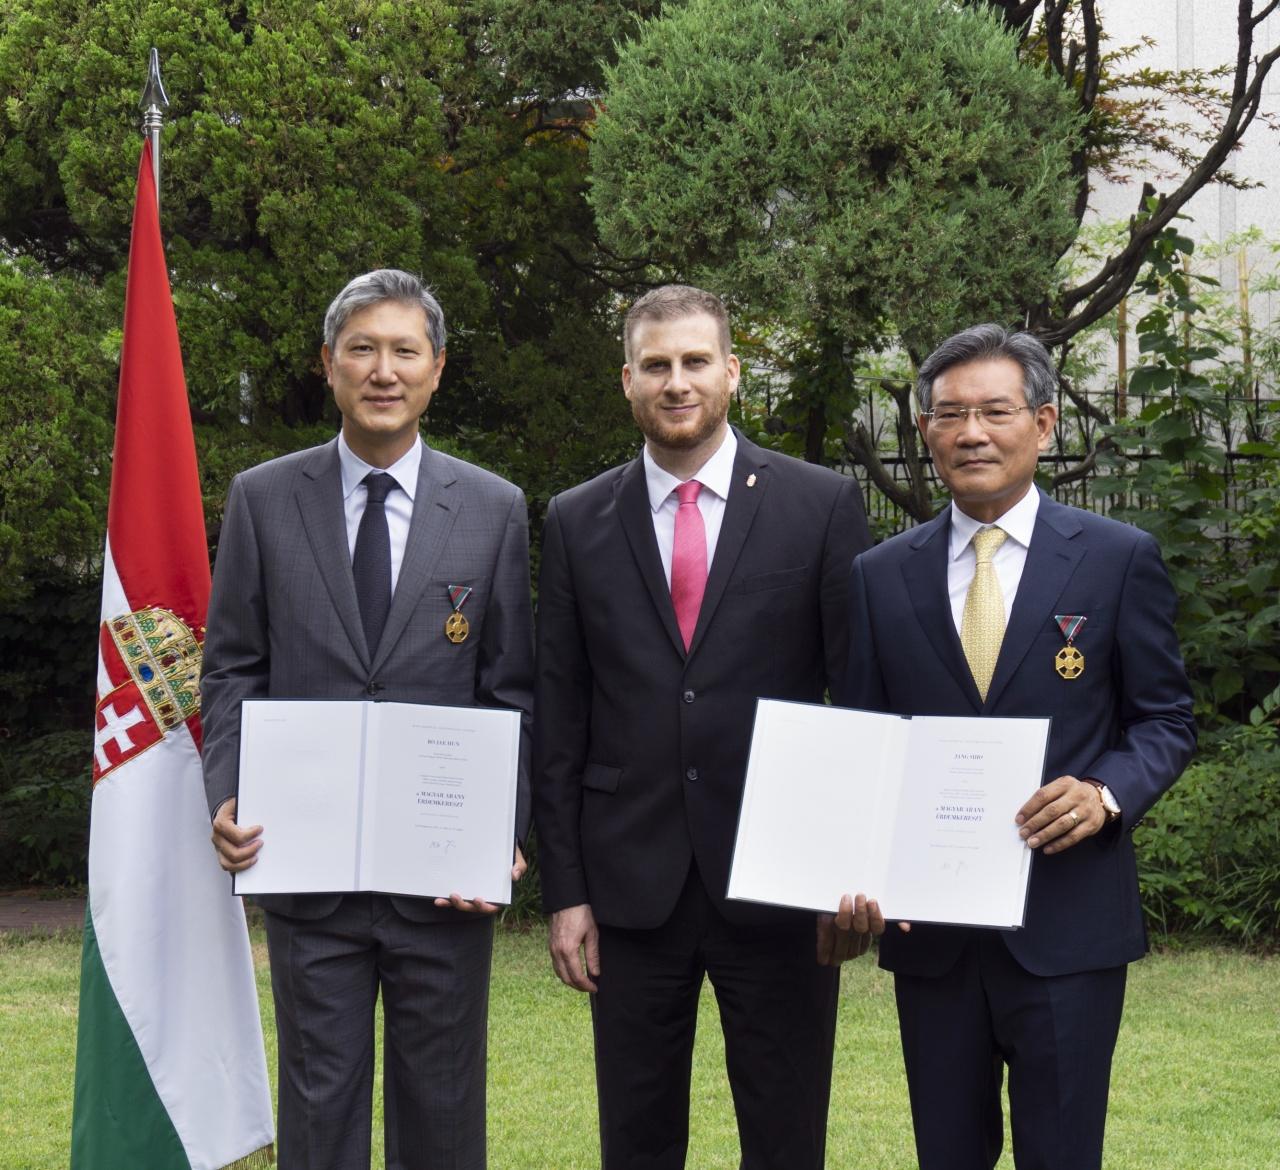 (Embassy of Hungary in Seoul)